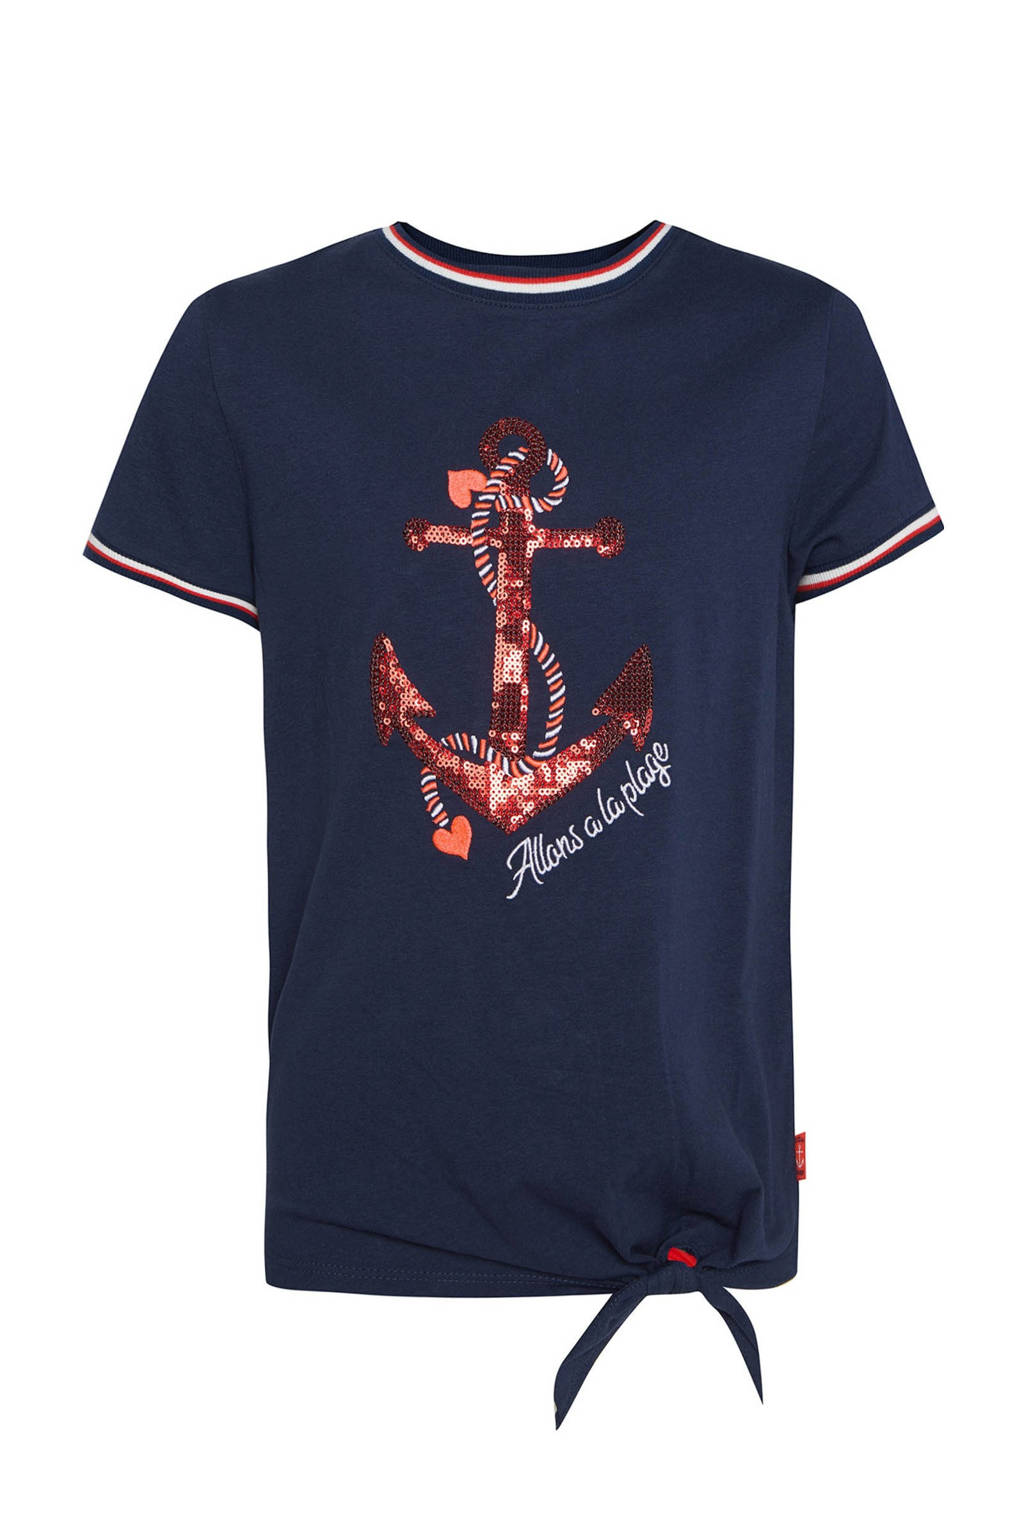 WE Fashion regular fit T-shirt met printopdruk en pailletten donkerblauw/rood/wit, Donkerblauw/rood/wit